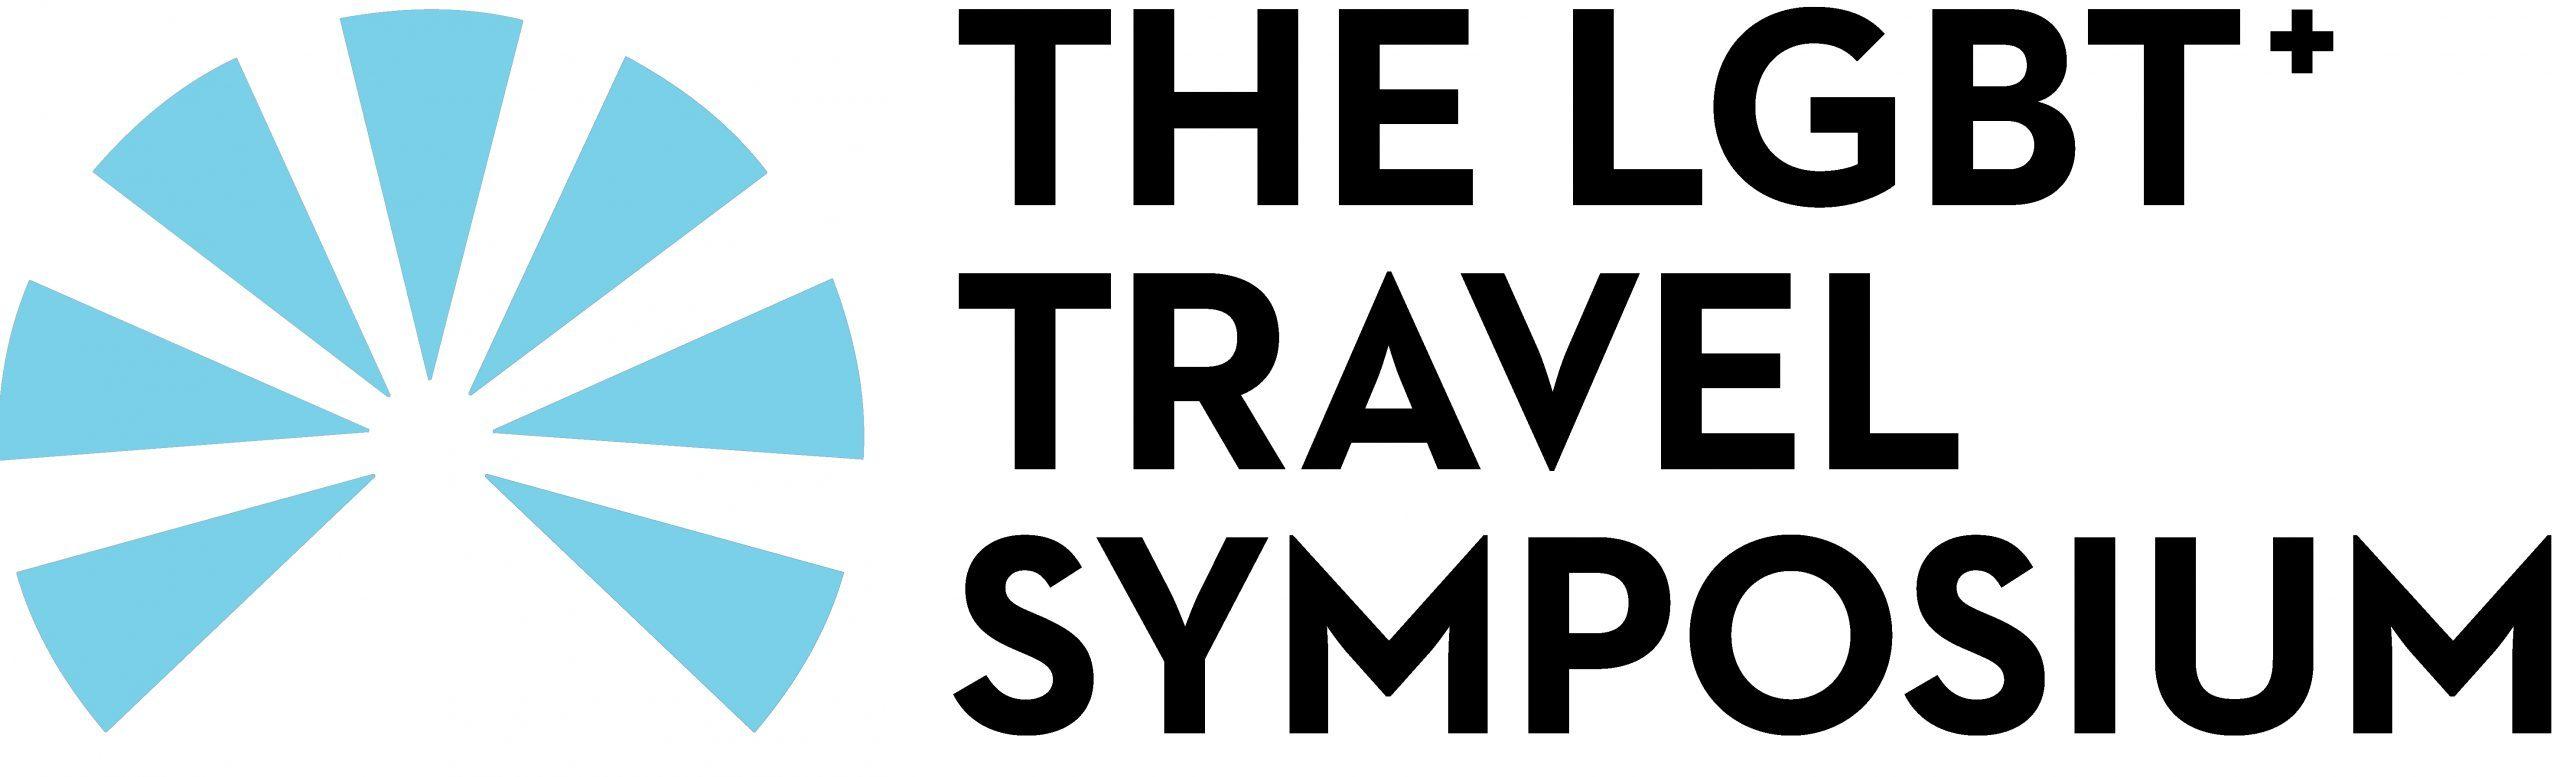 The LGBT+ Travel Symposium